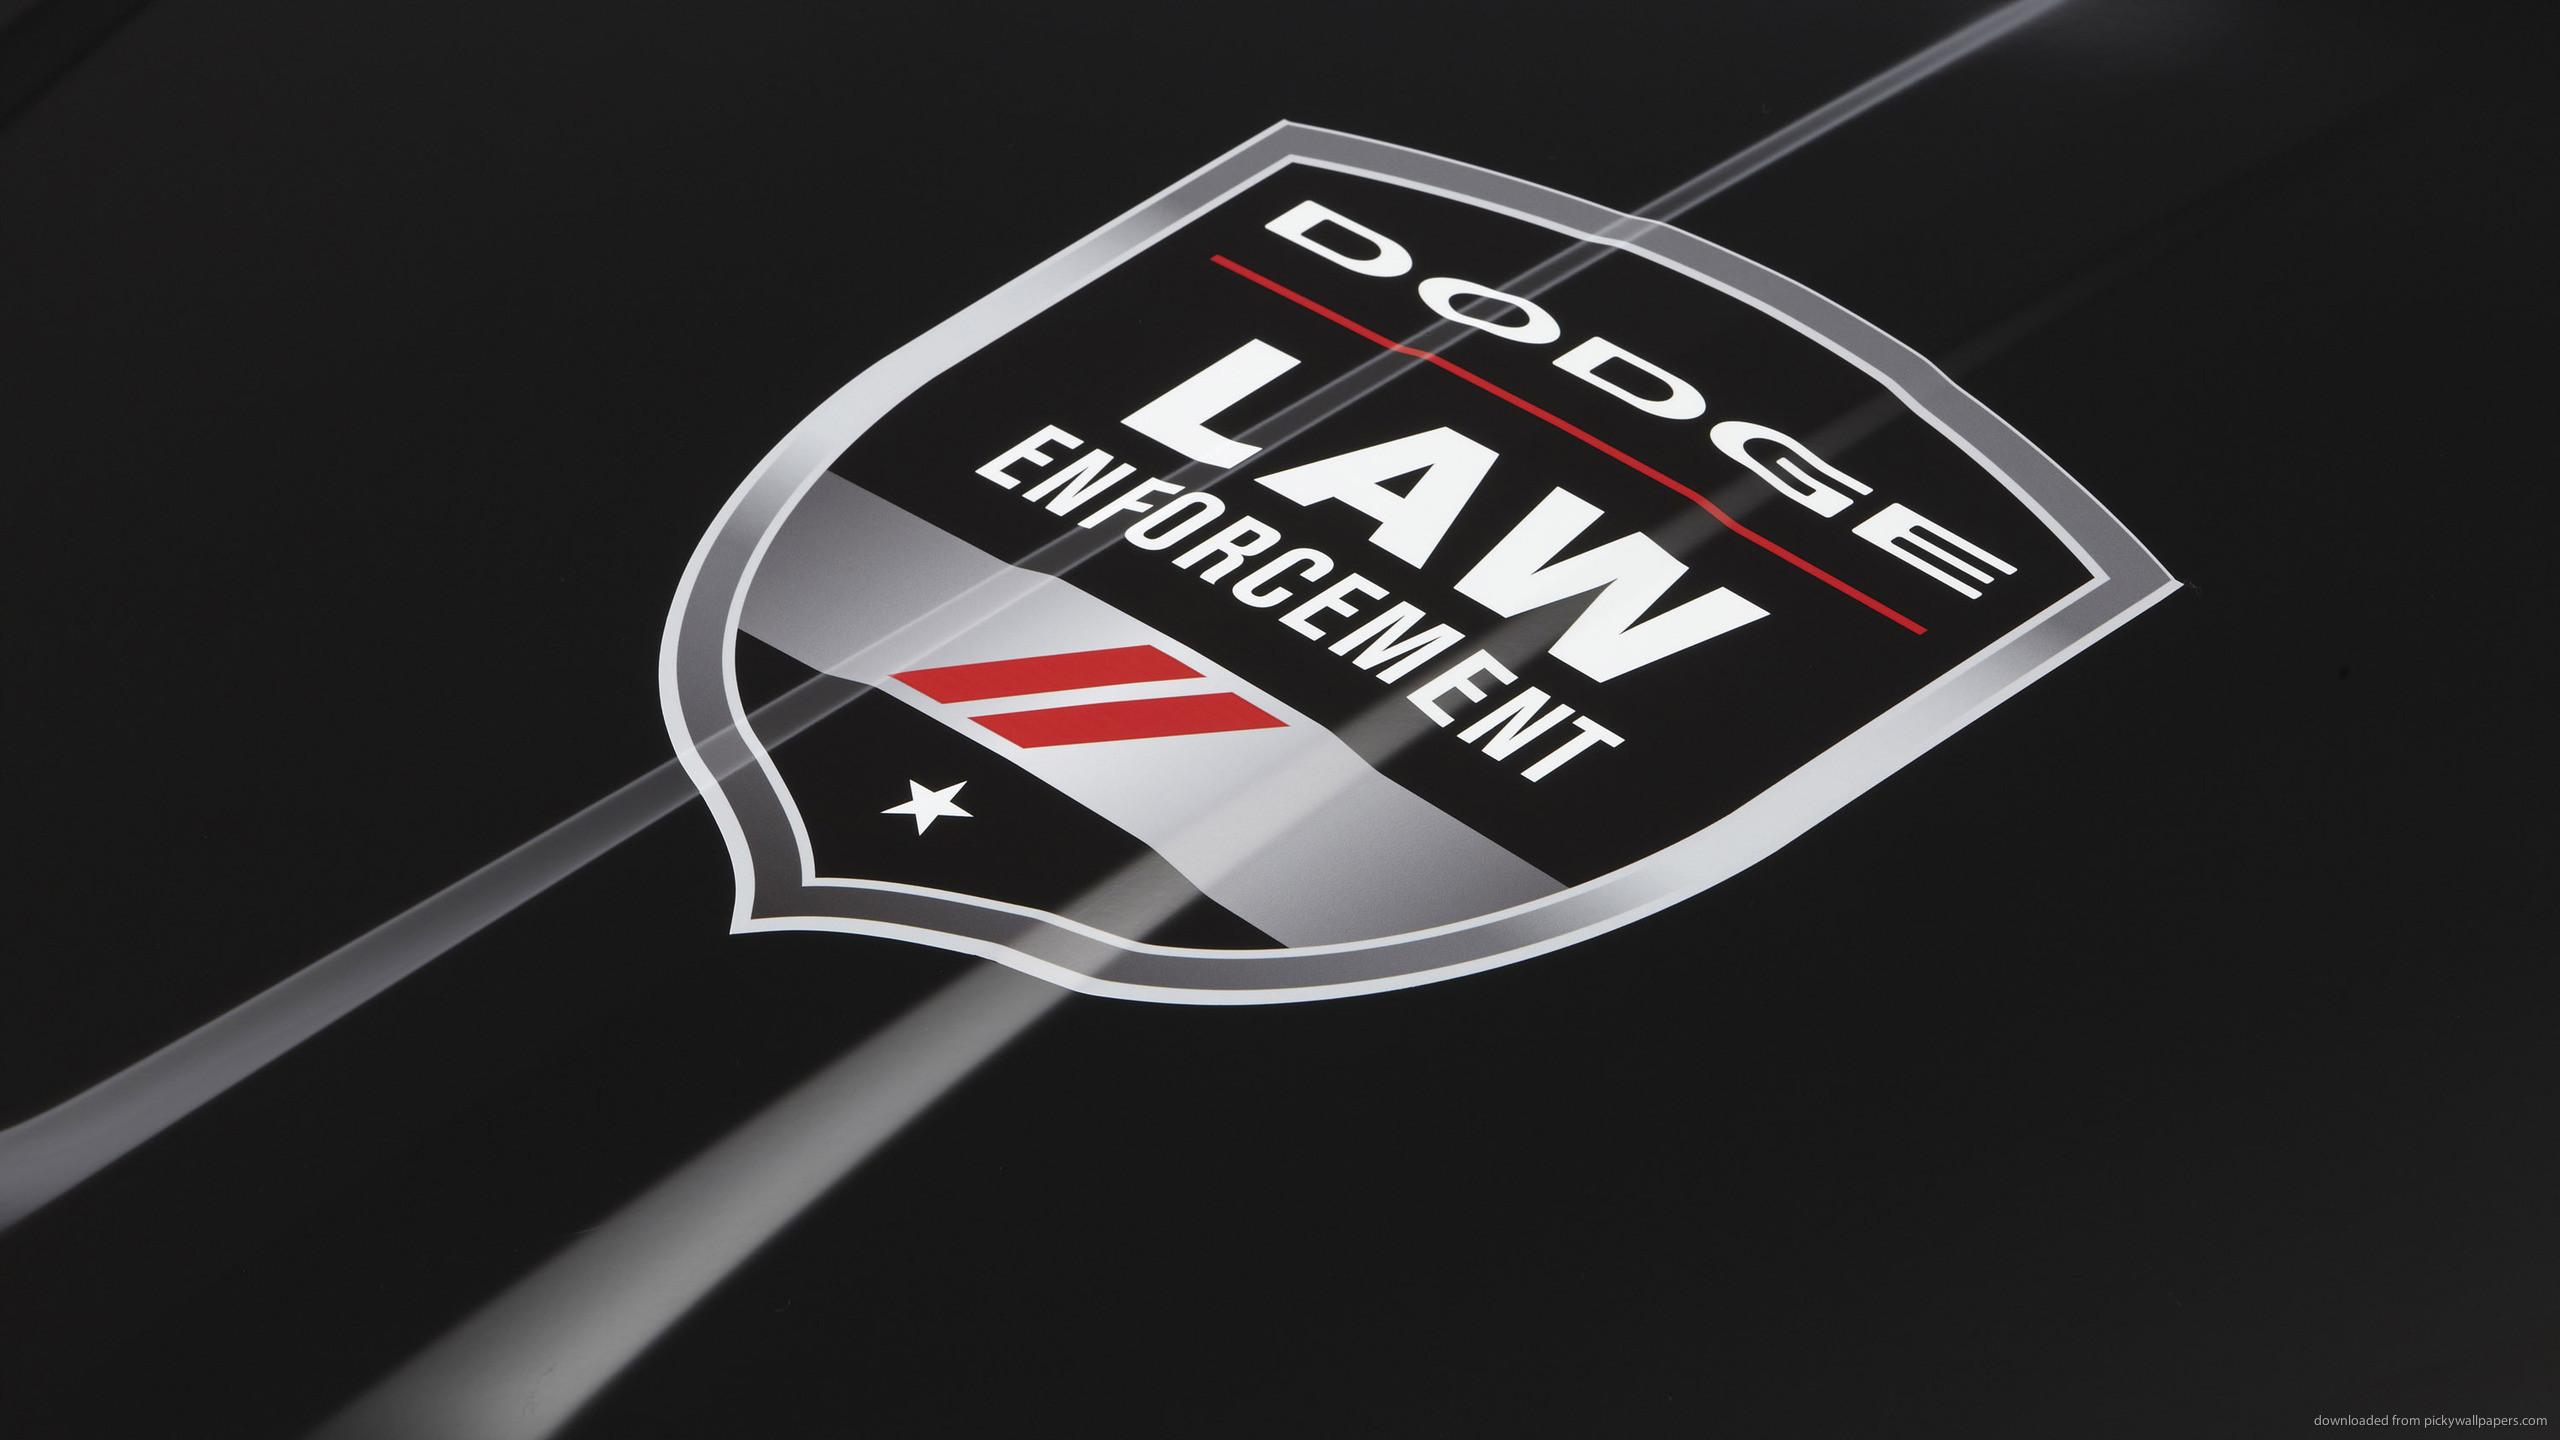 Dodge Charger HD Wallpapers Backgrounds Wallpaper | HD Wallpapers |  Pinterest | Dodge charger, Dodge and Hd desktop